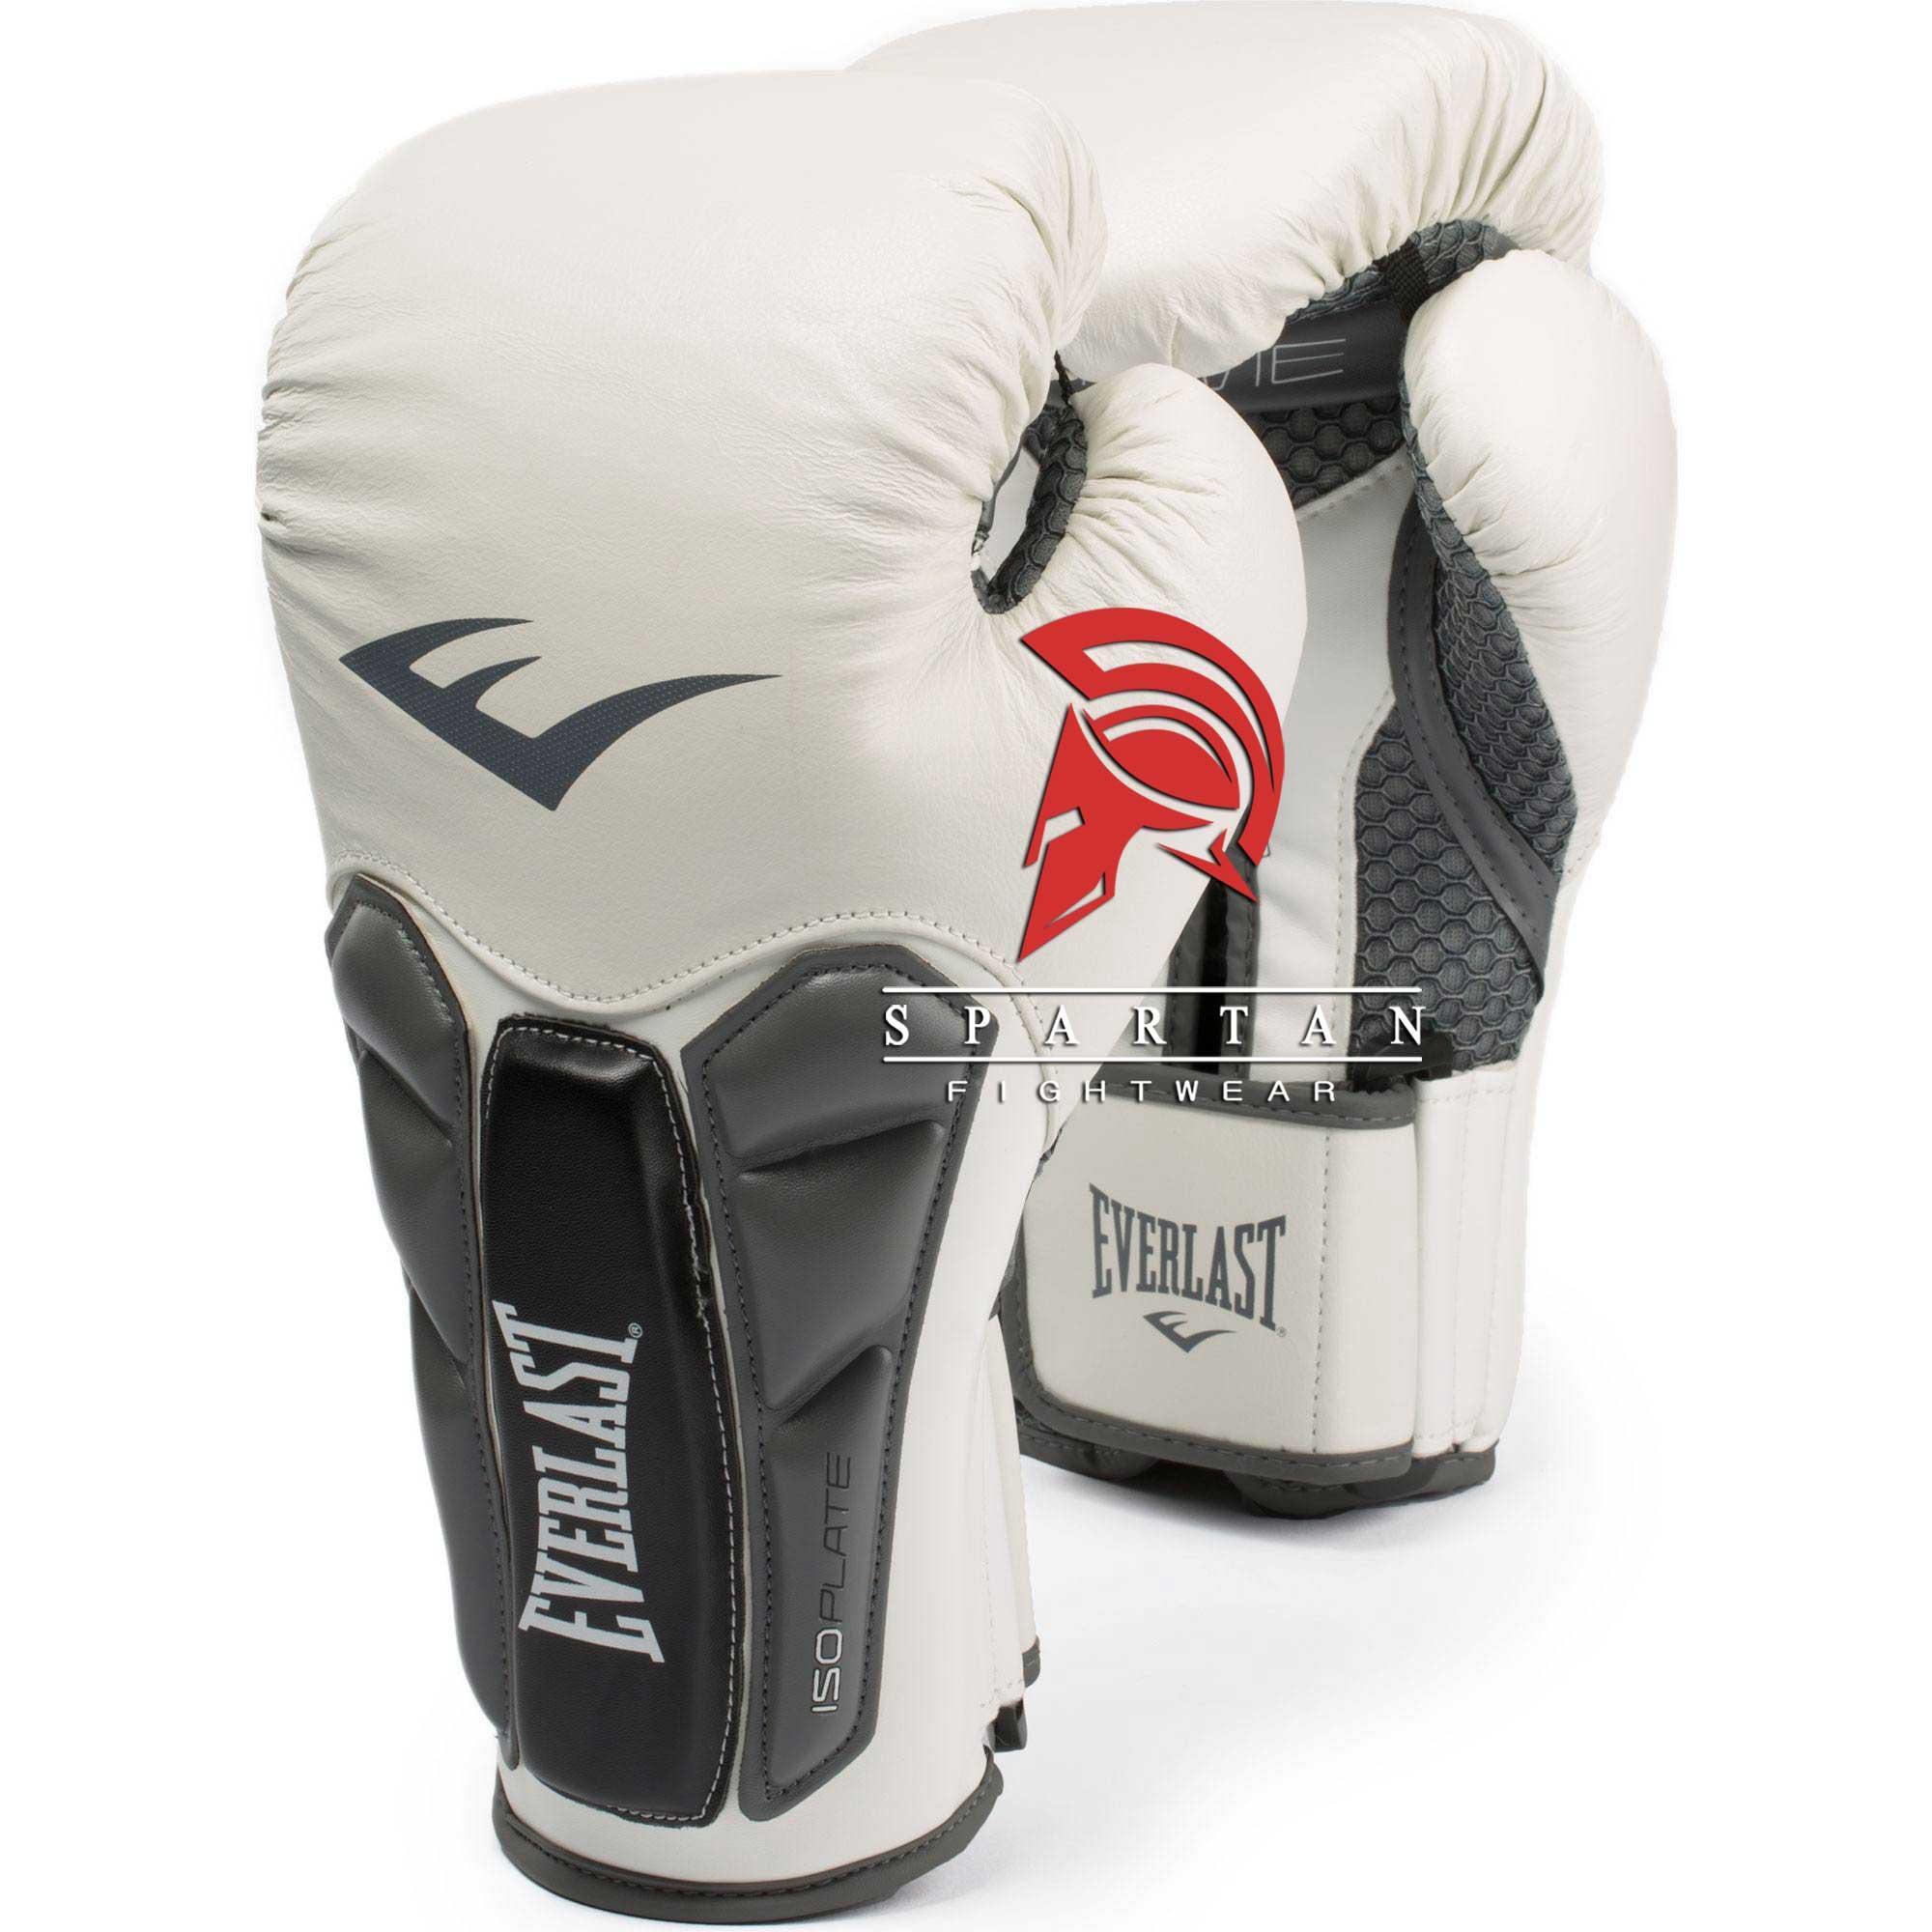 Sarung Tinju Everlast, Sarung Tinju Muay Thai, Boxing Glove Everlast G029